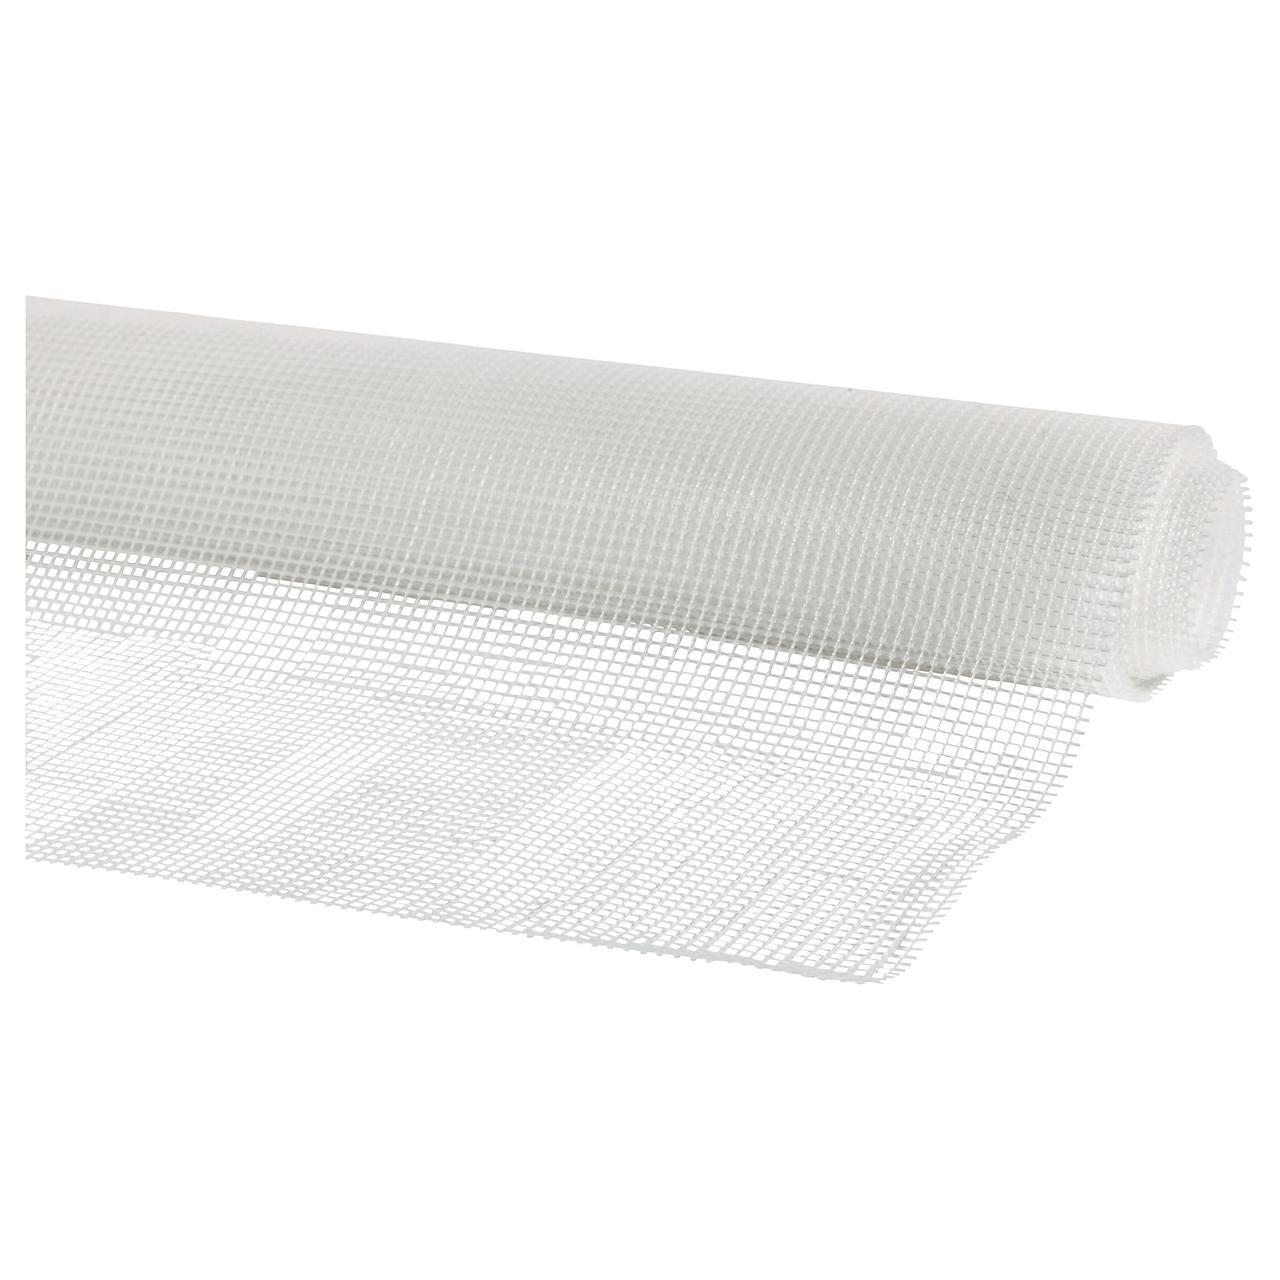 IKEA STOPP (802.278.77) Противоскользящая прокладка